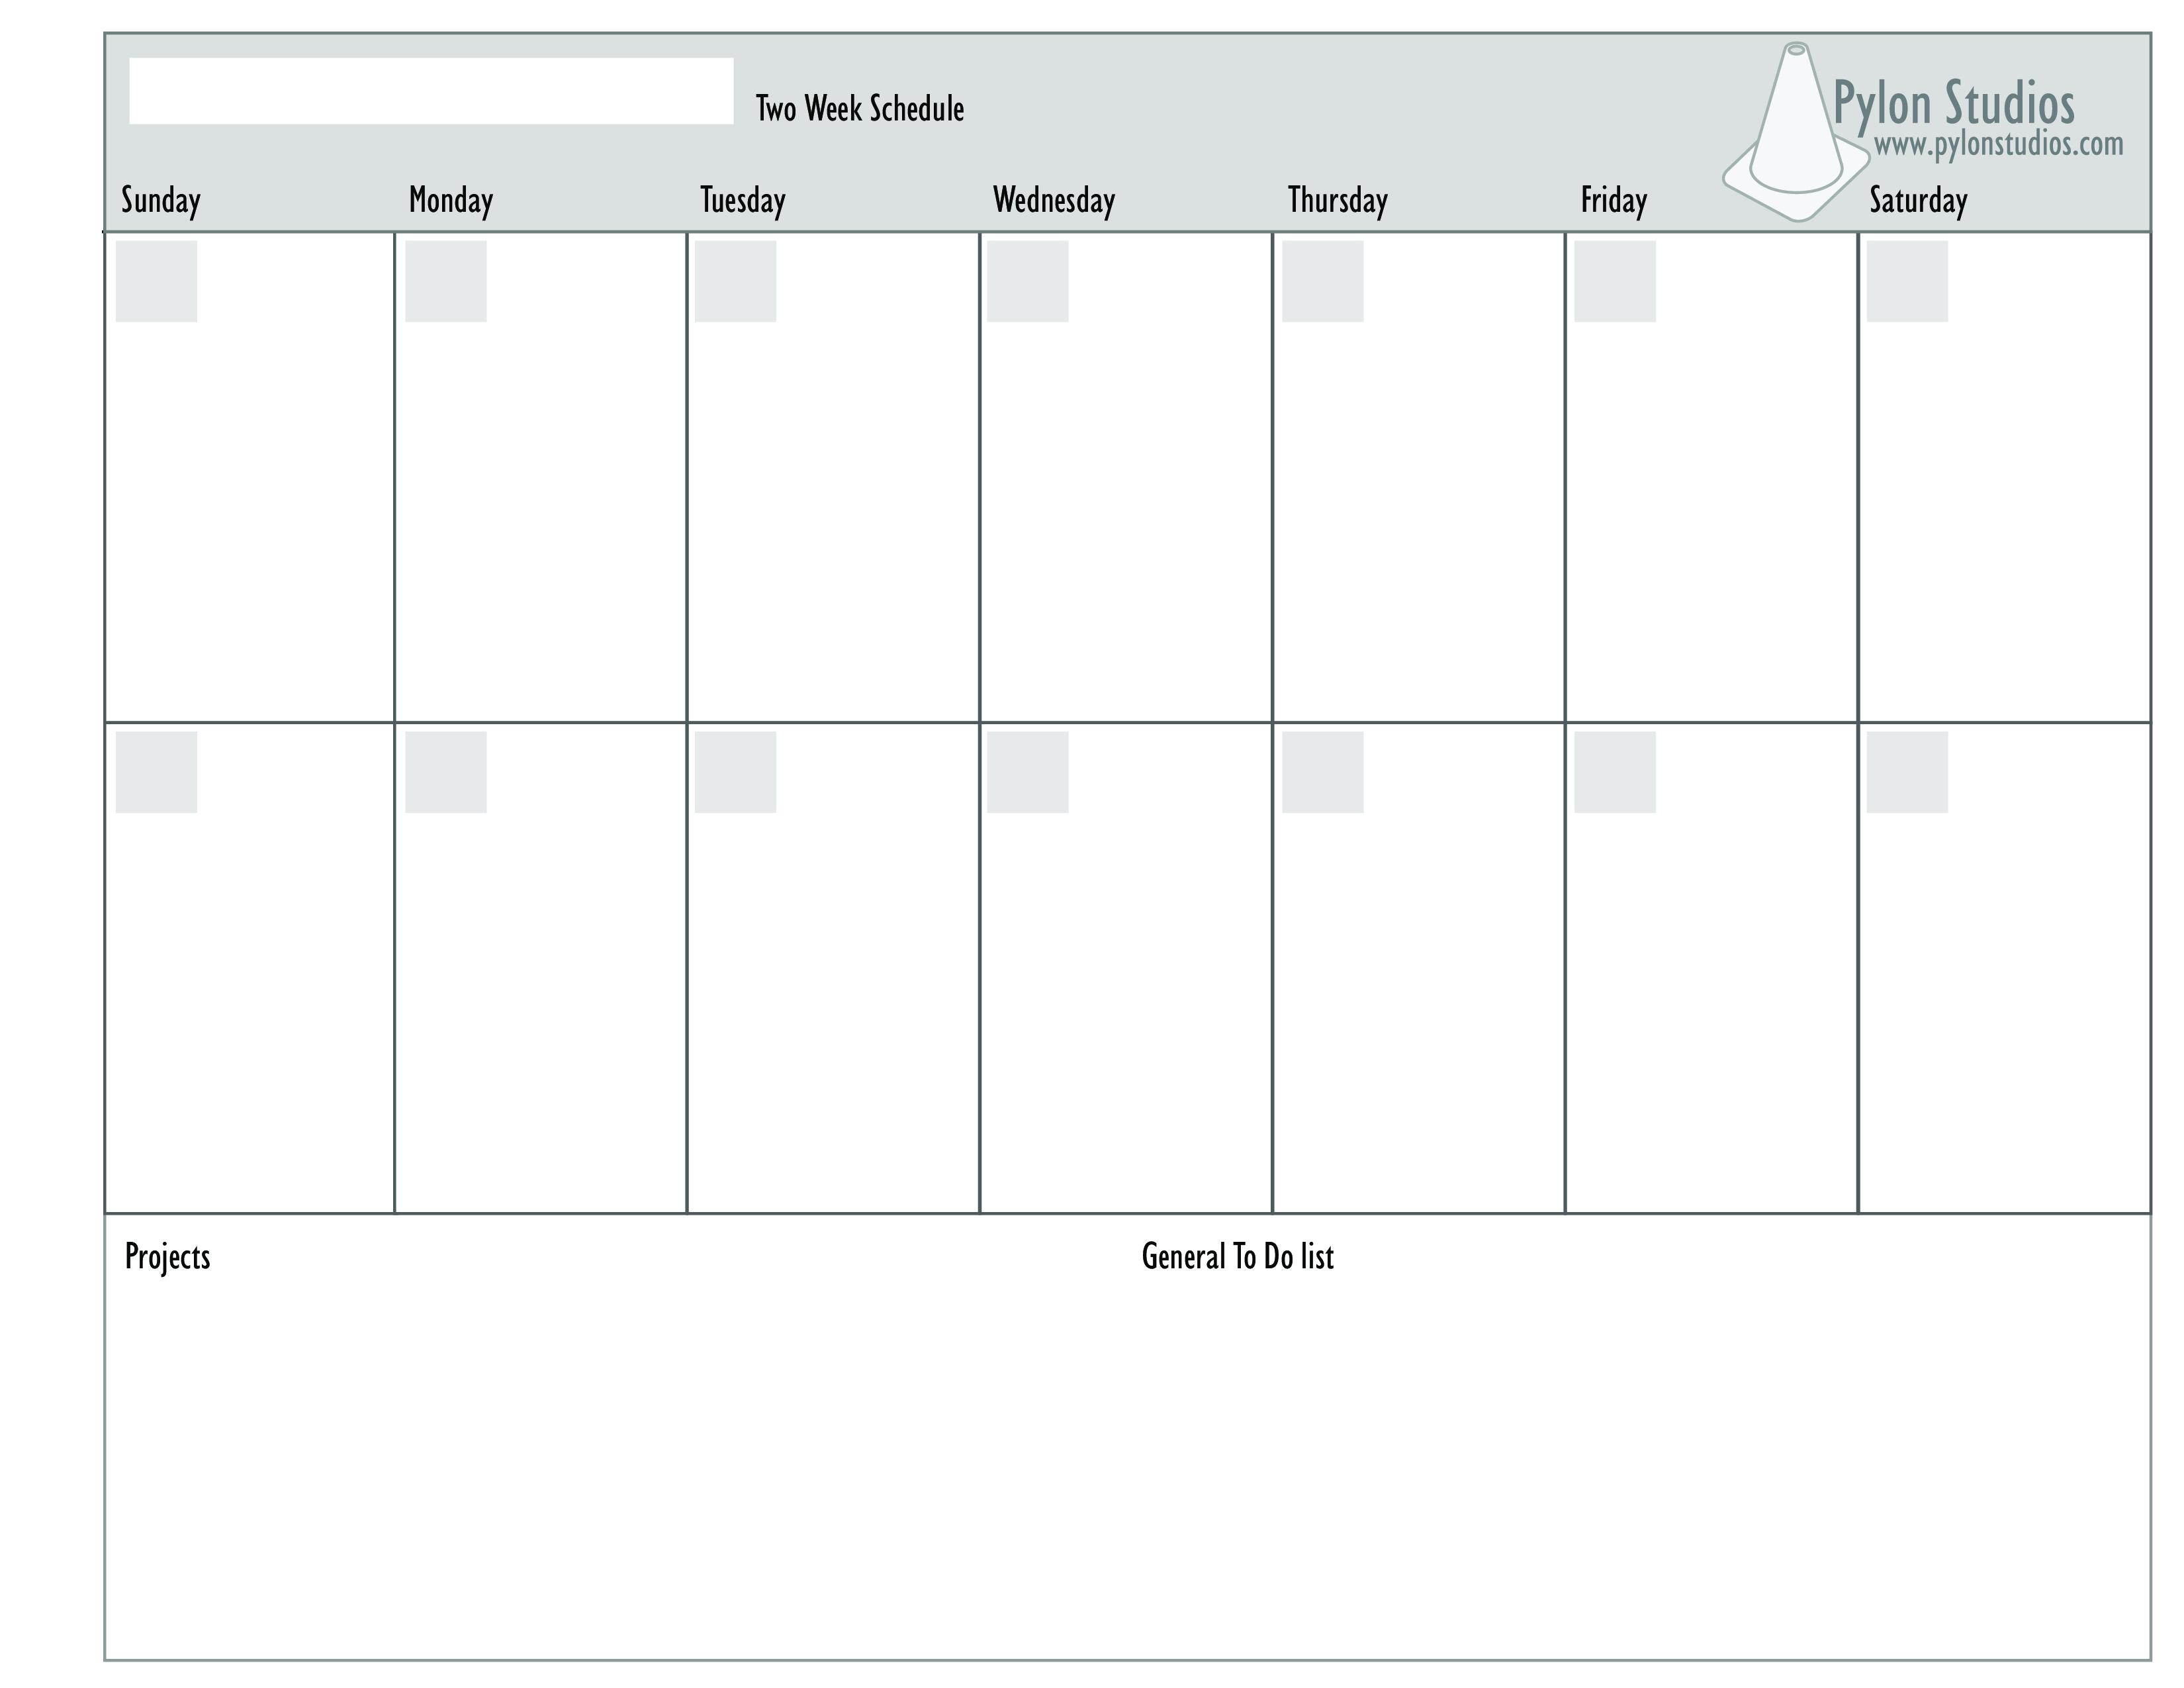 Free Week Calendar Templates At Allbusinesstemplates Com Schedule within Blank Two Week Schedule Template